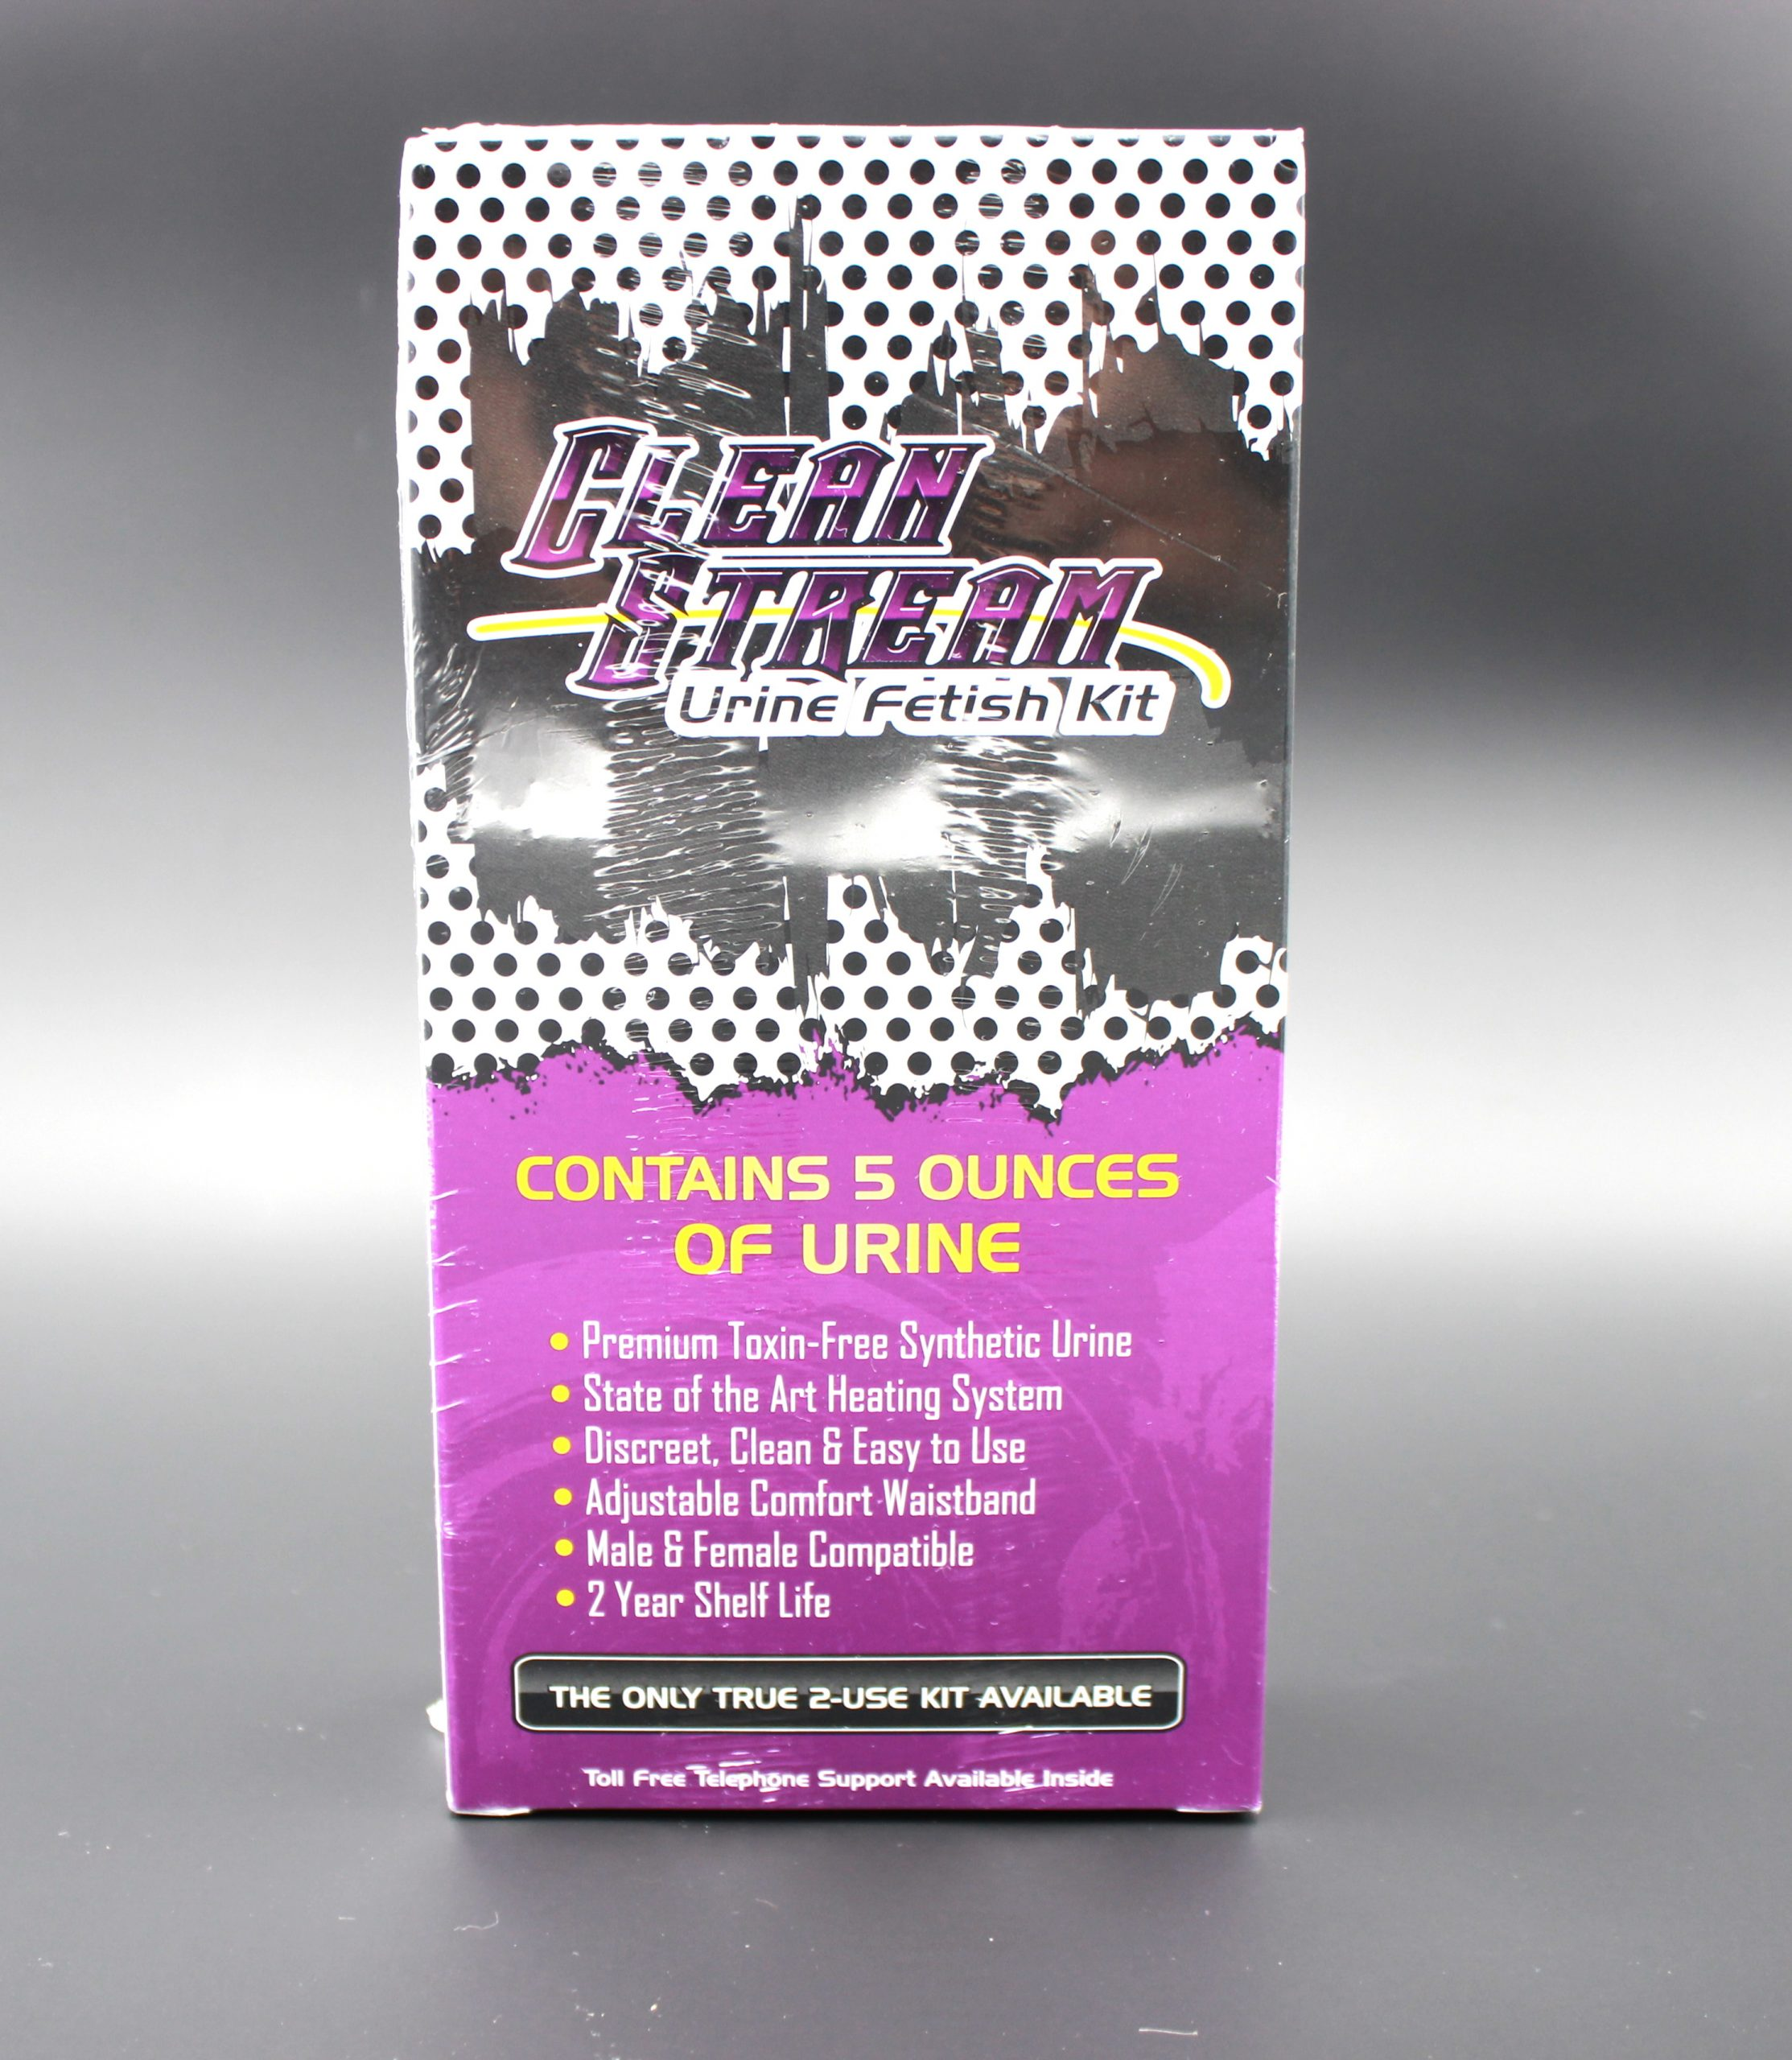 CLEAN STREAM Urine Fetish Kit 5oz